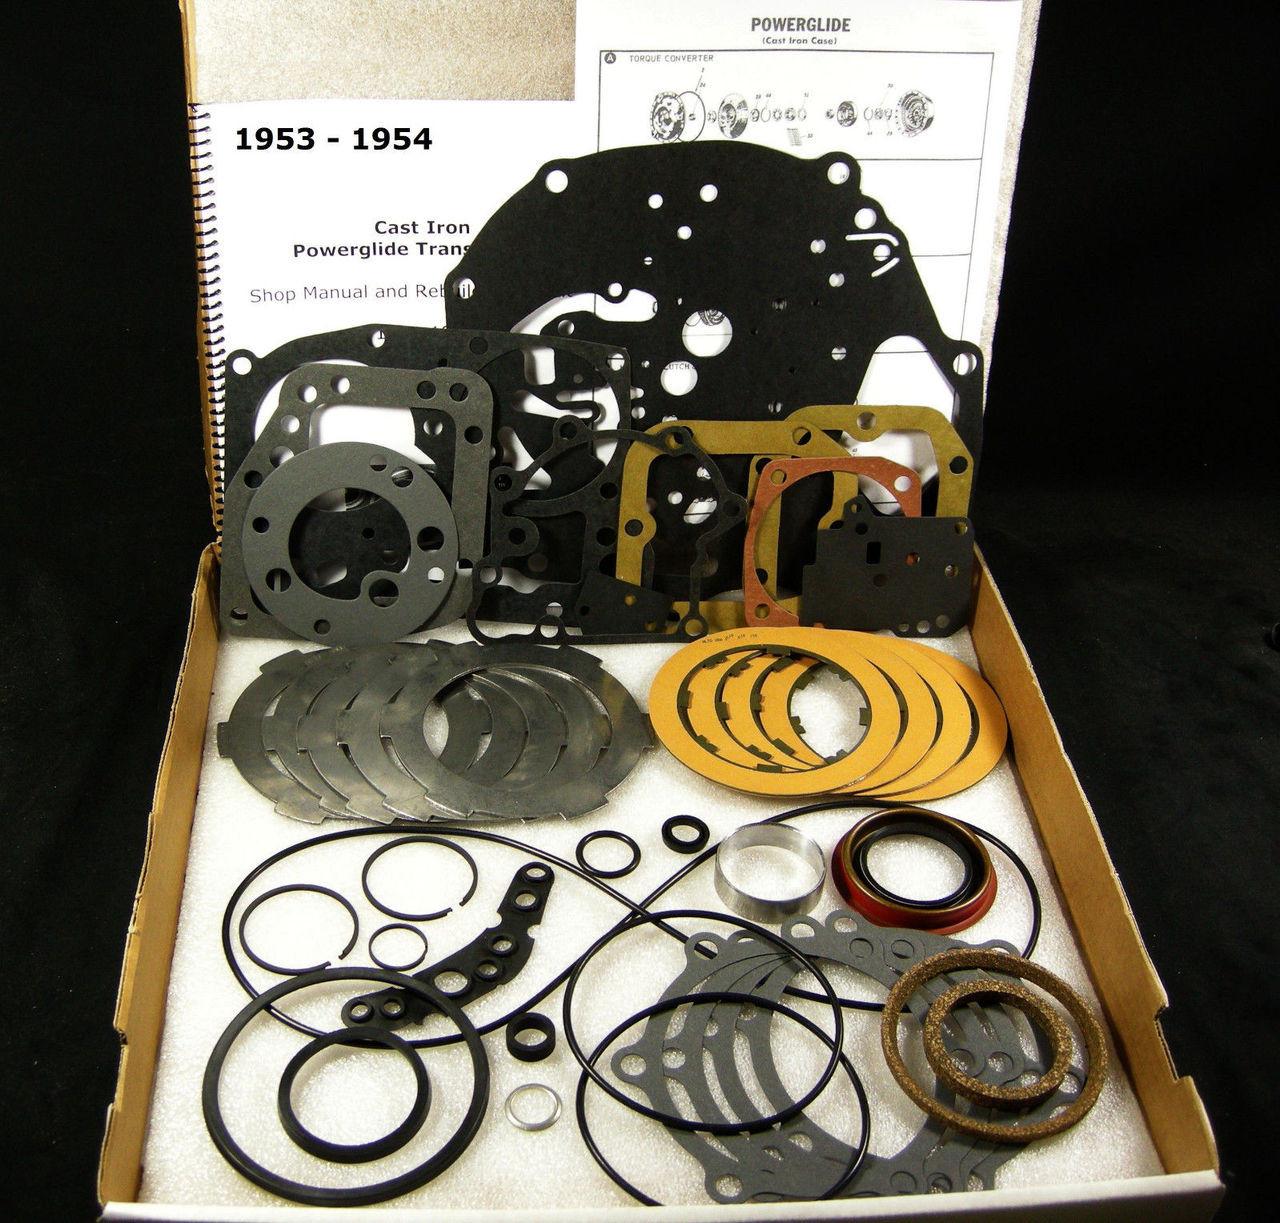 hight resolution of 1953 54 cast iron powerglide transmission rebuild overhaul part kit cast iron powerglide transmission diagram